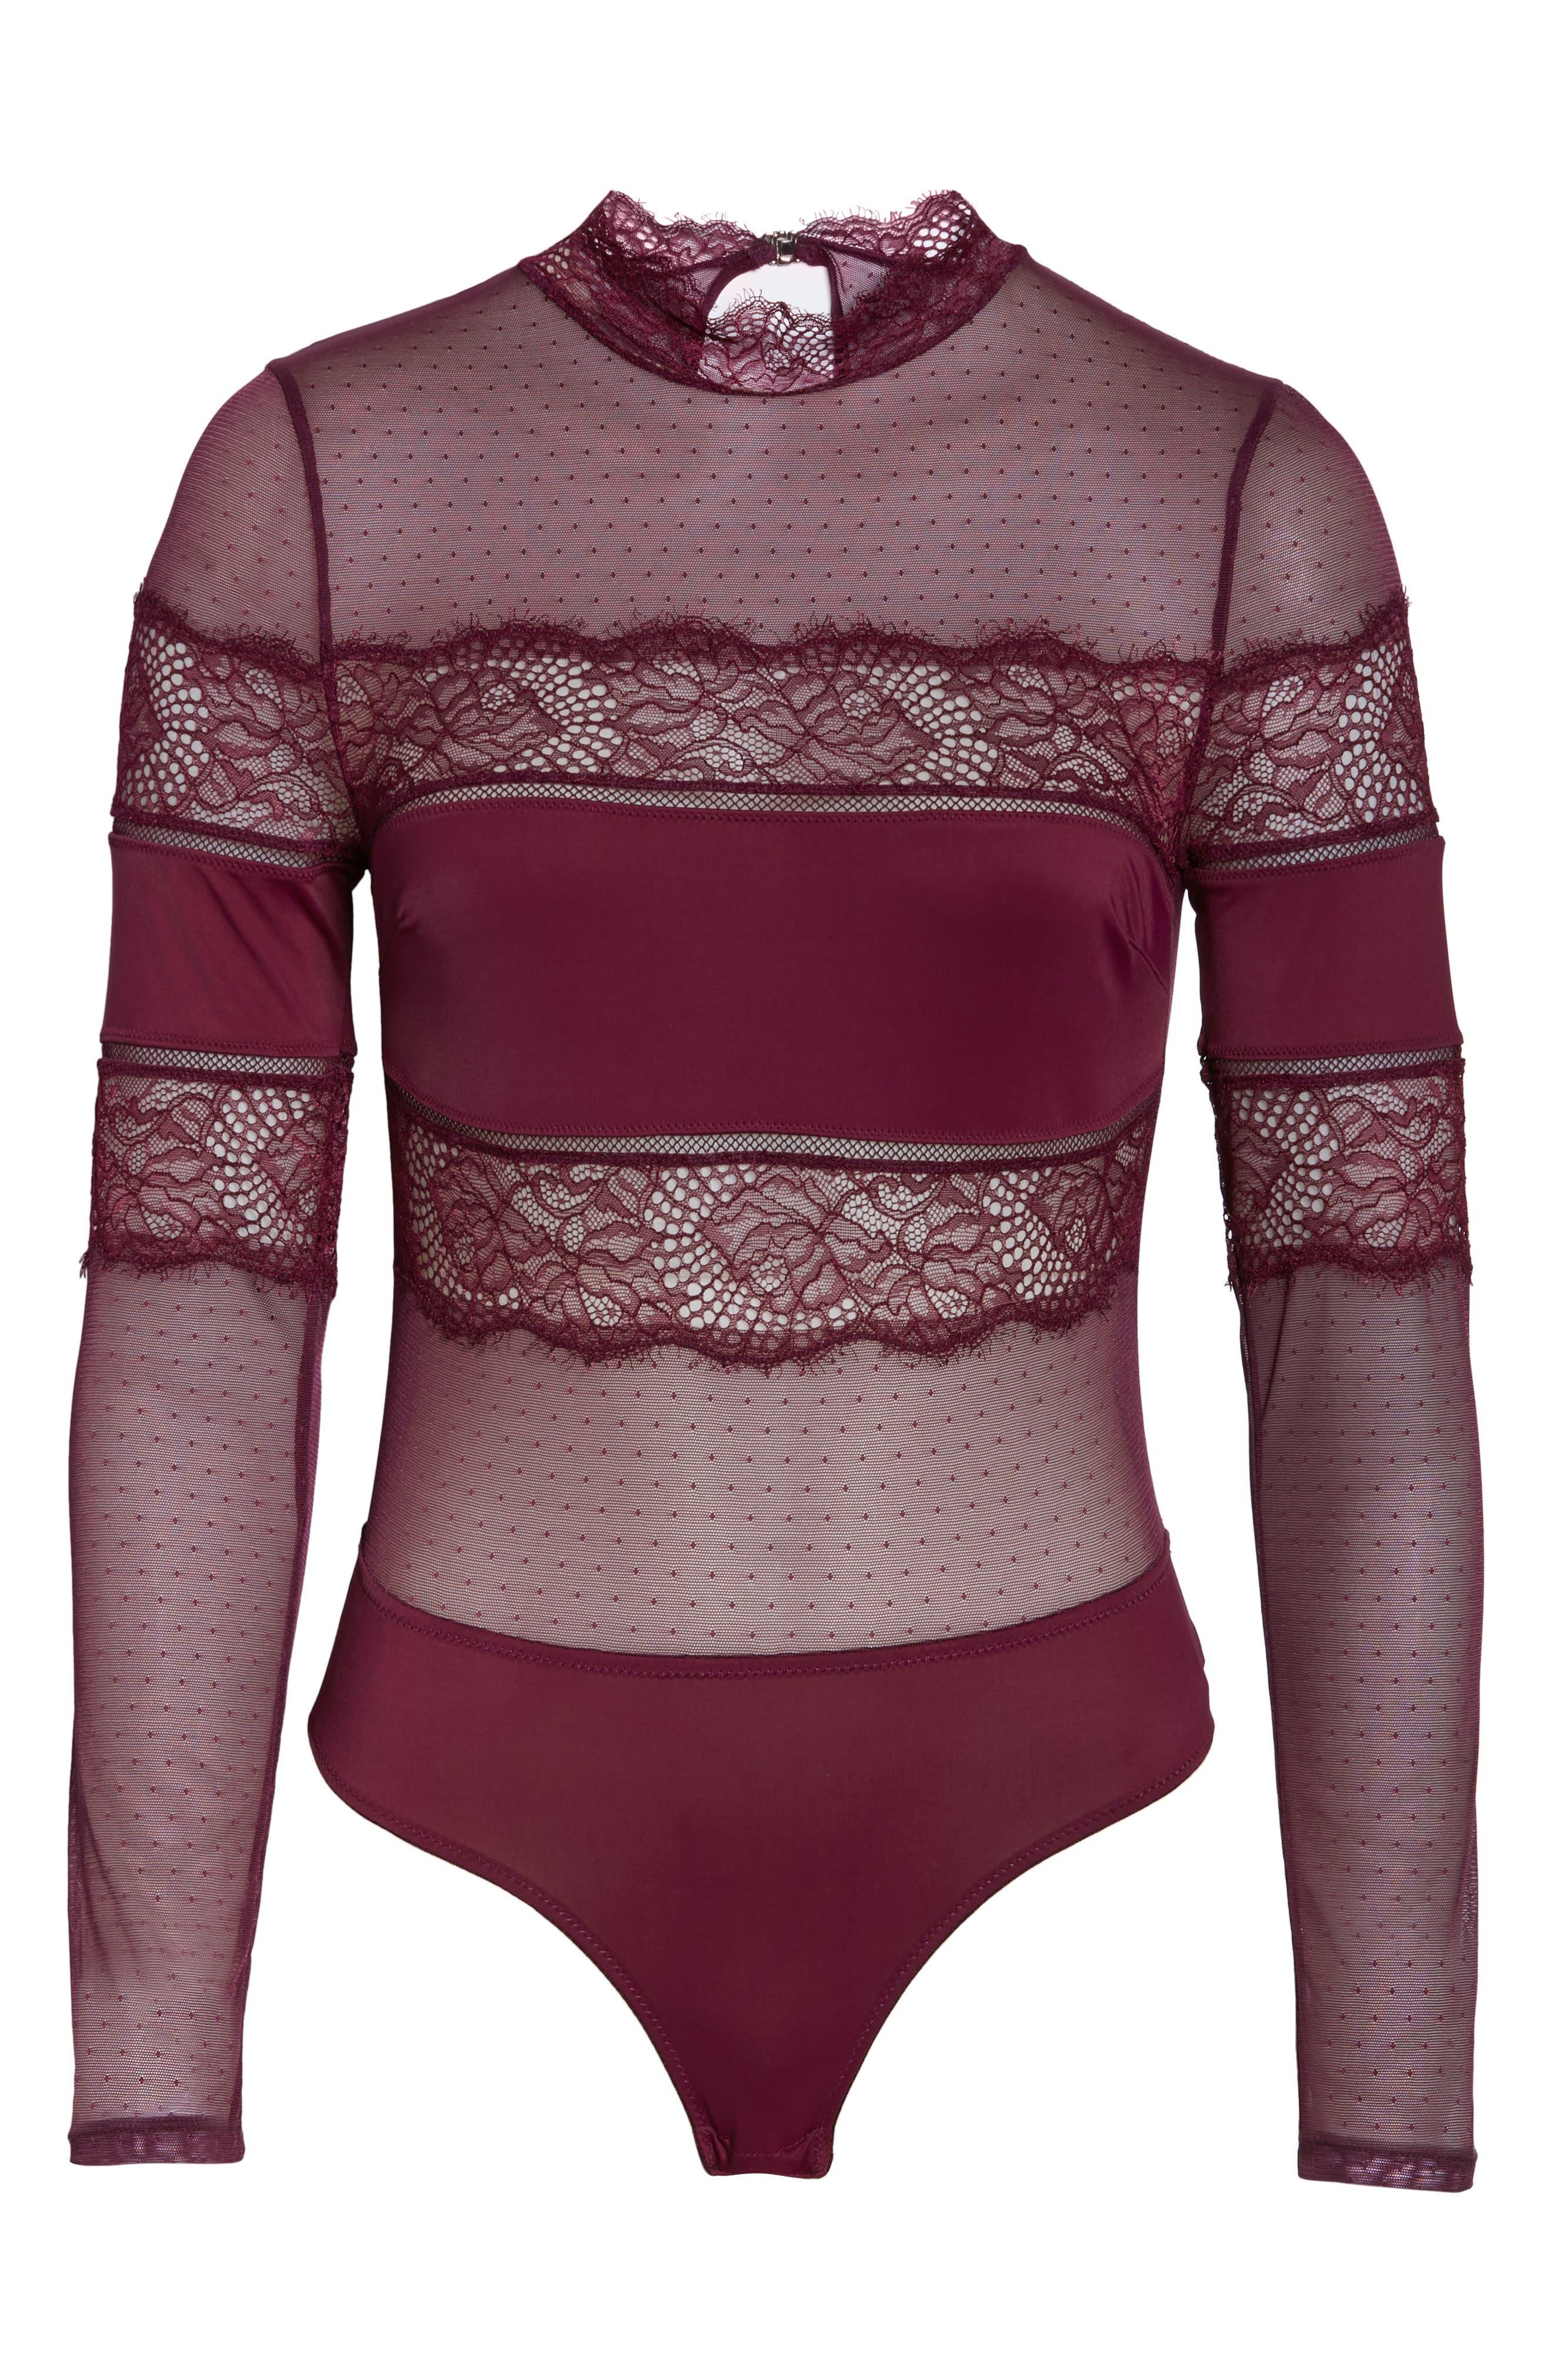 Amore Long Sleeve Bodysuit,                             Alternate thumbnail 6, color,                             CHERRY